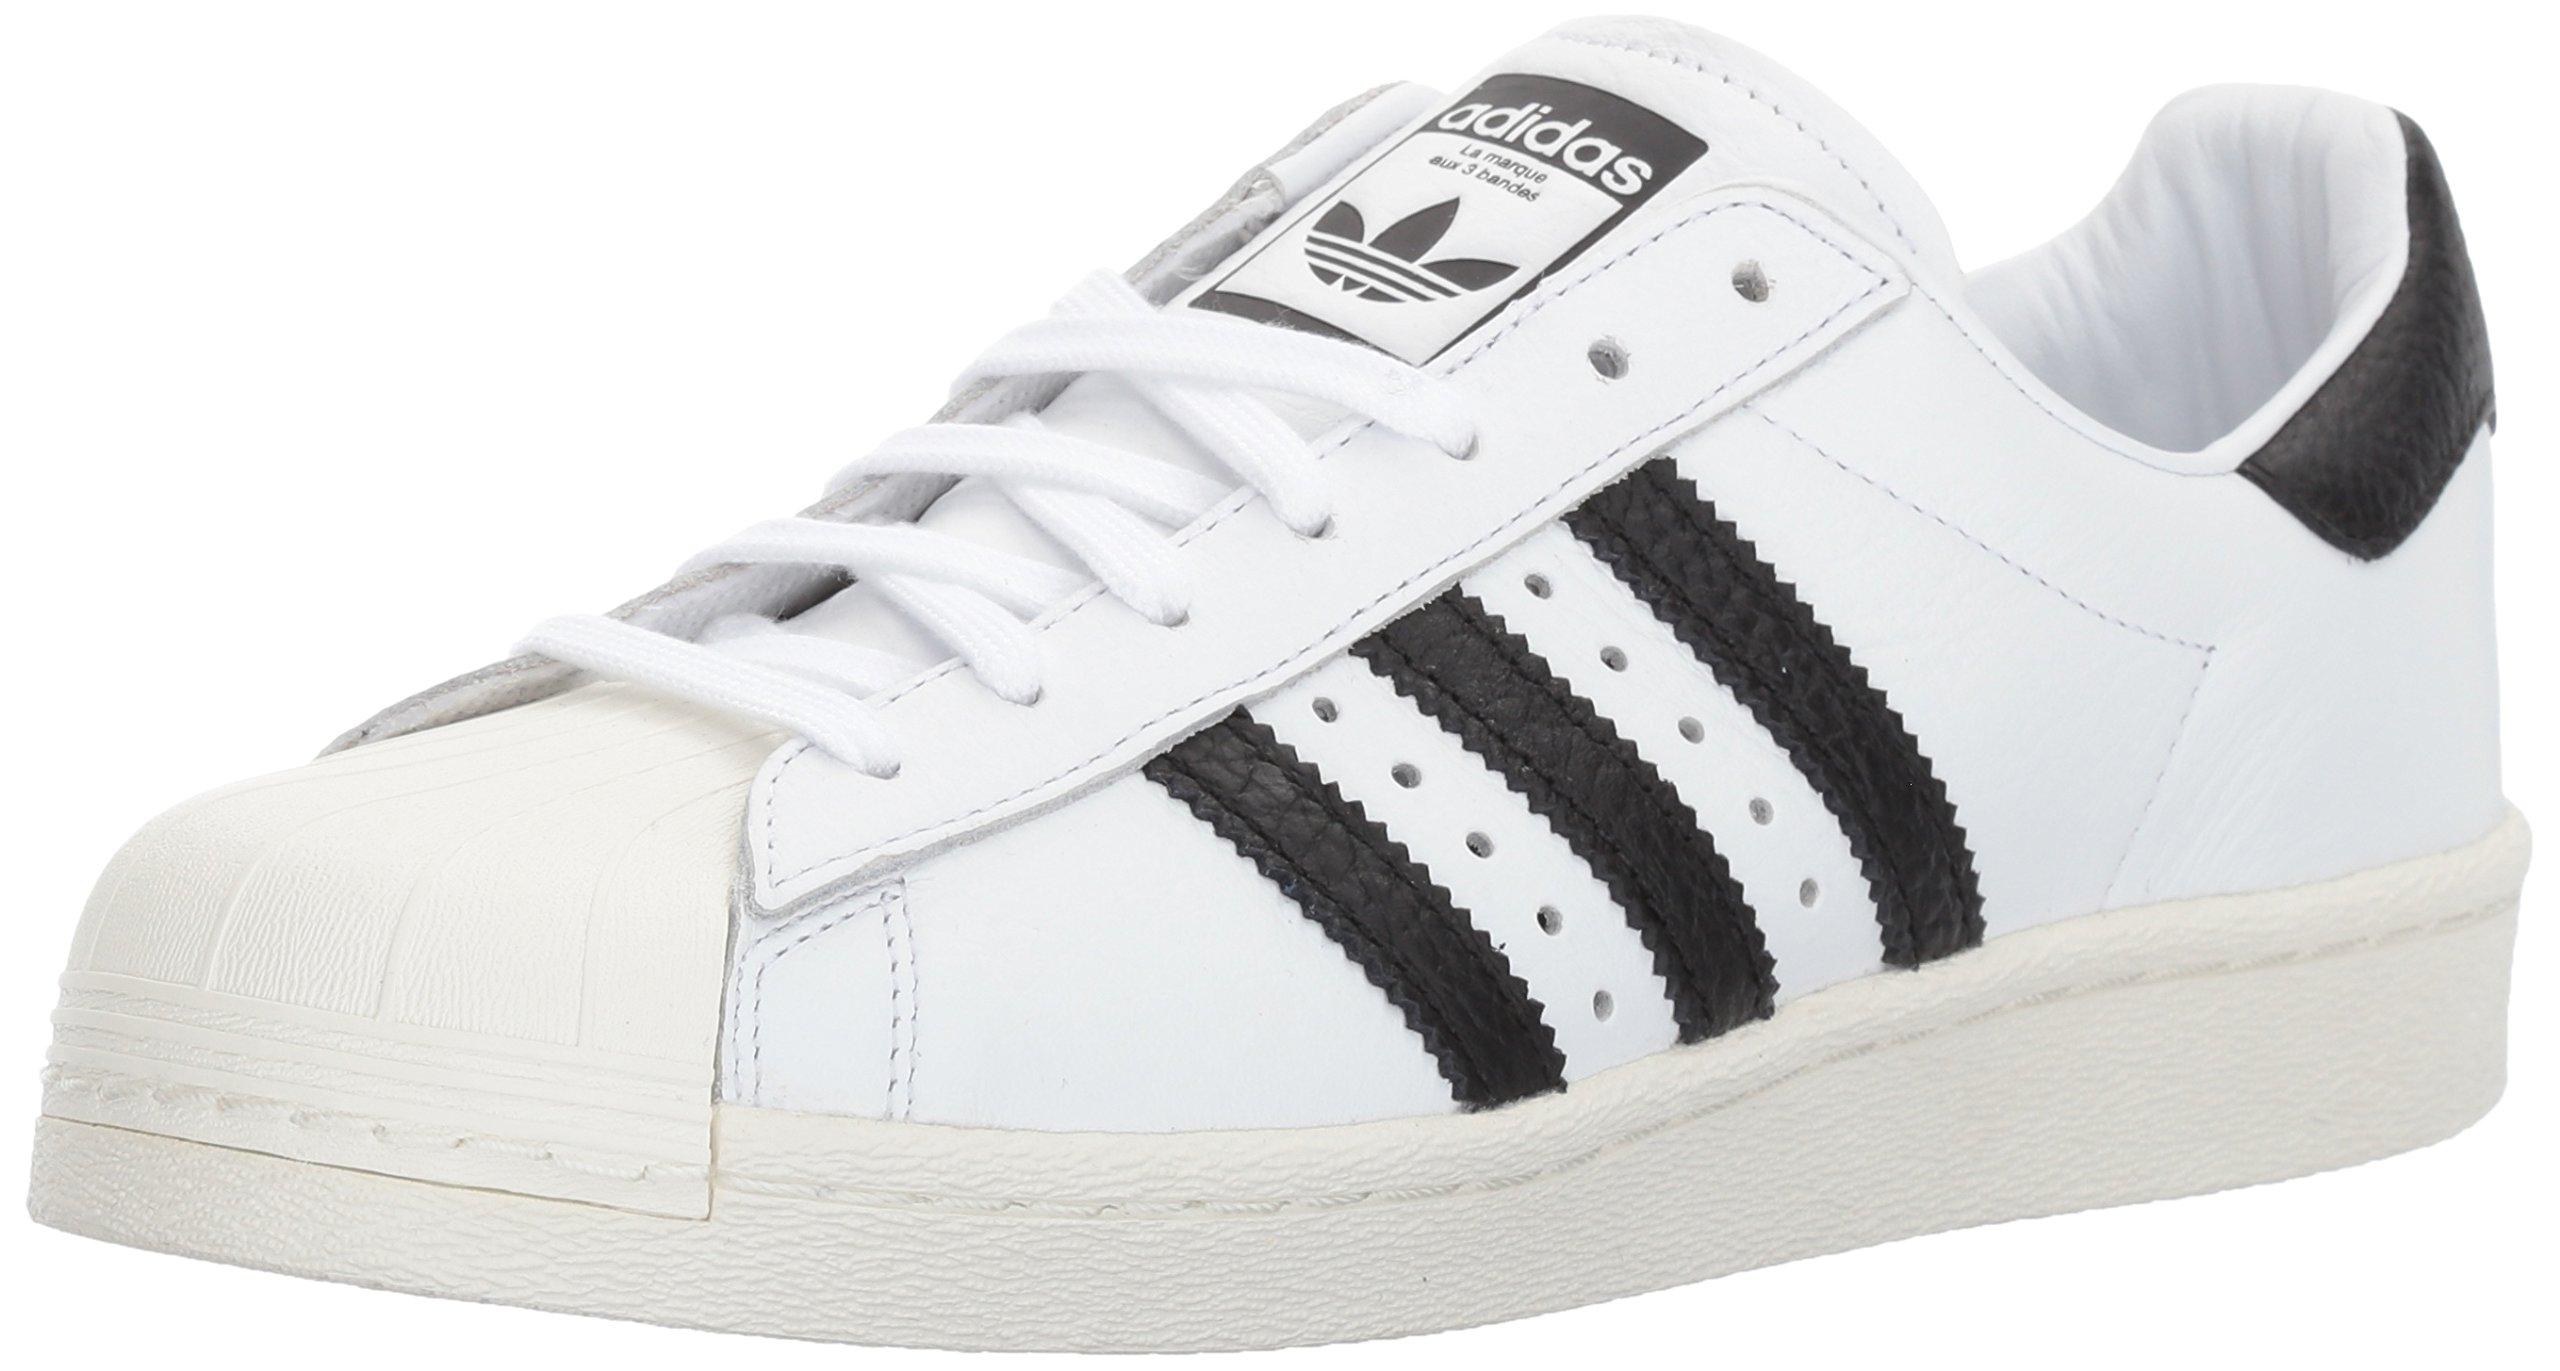 adidas Originals Men's Superstar Running Shoe, Black/White, 10.5 D(M) US